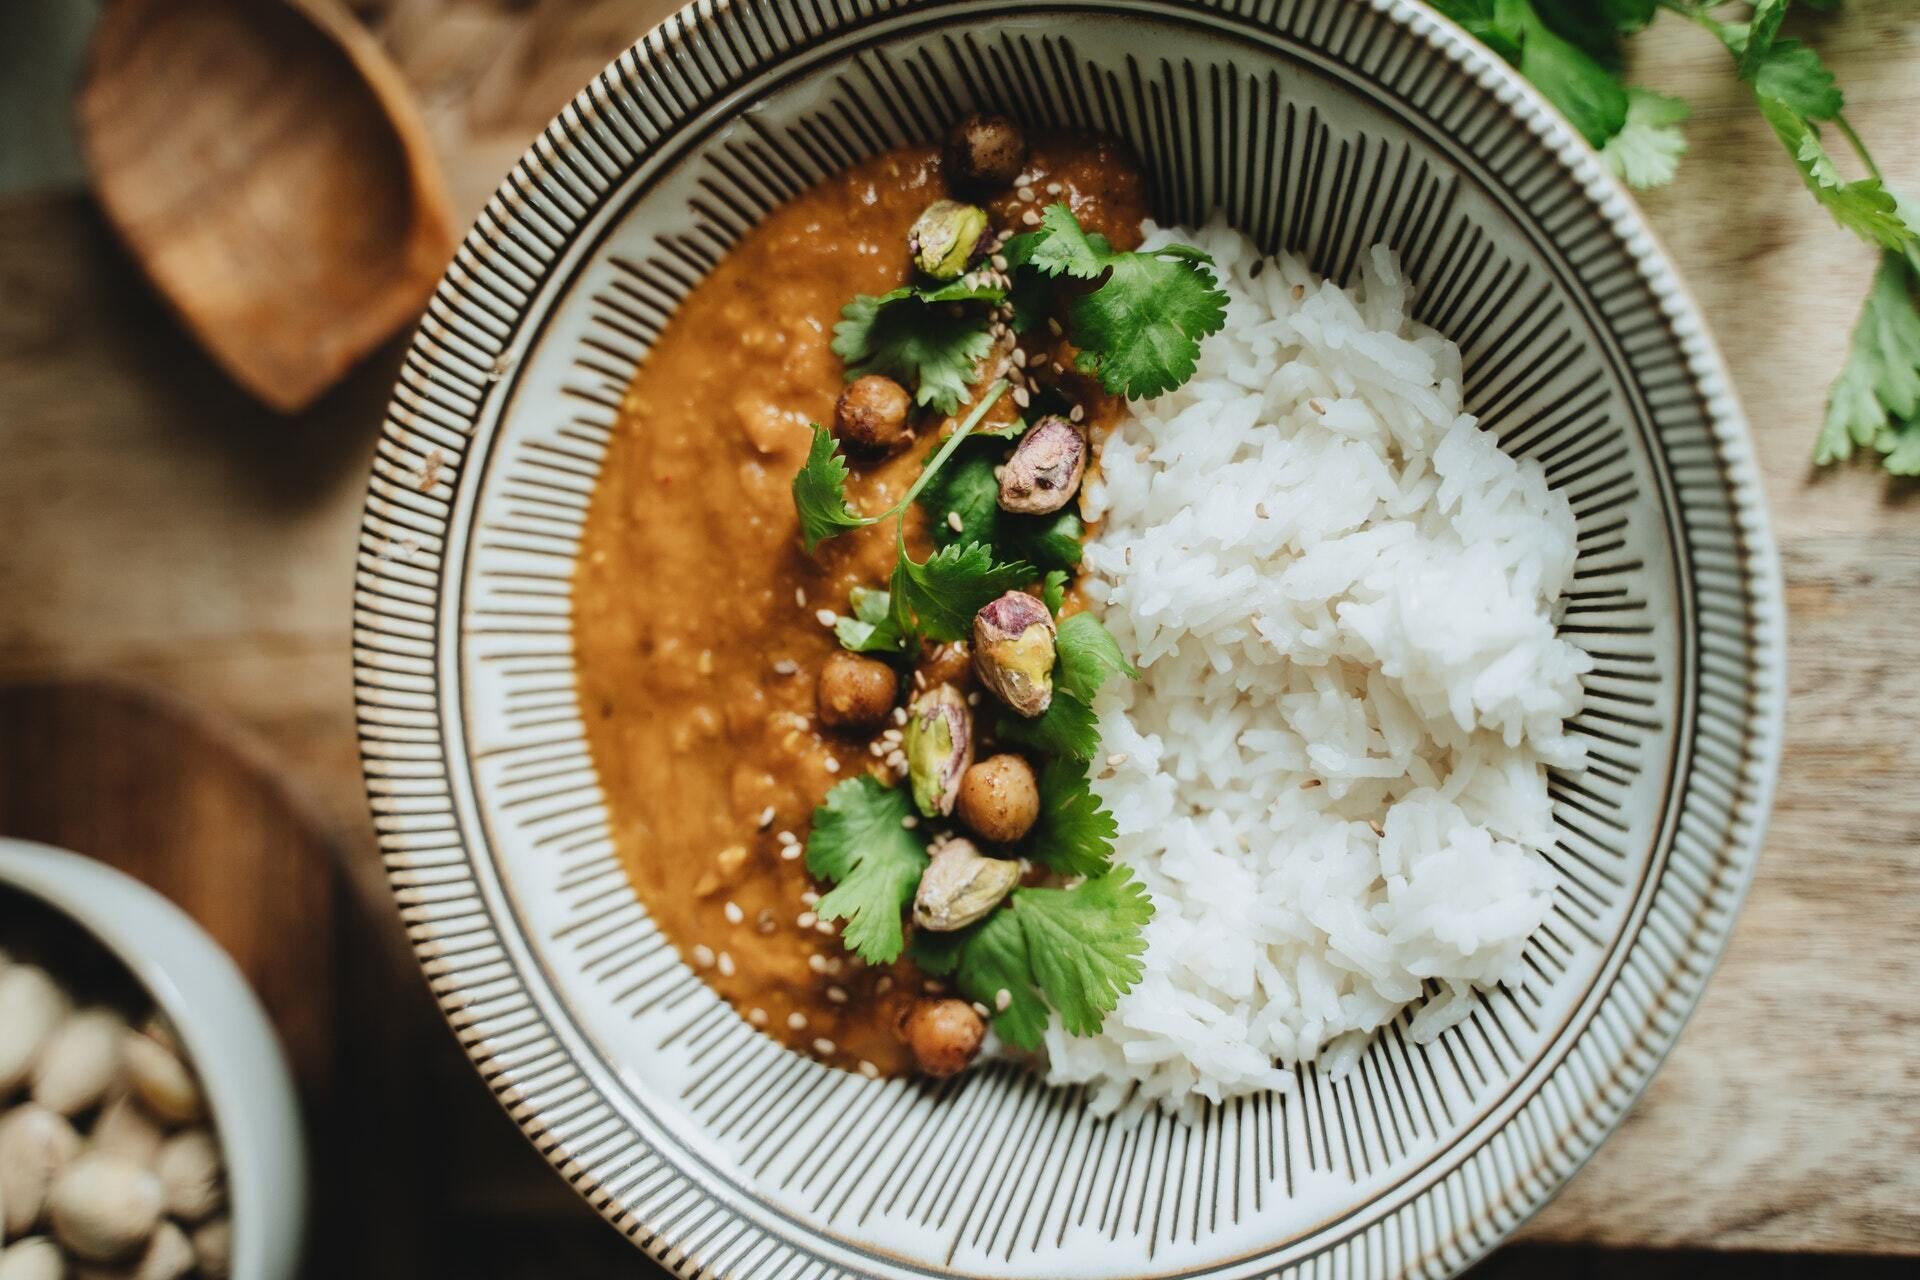 Рис можна приправити будь-якими приправами на ваш смак